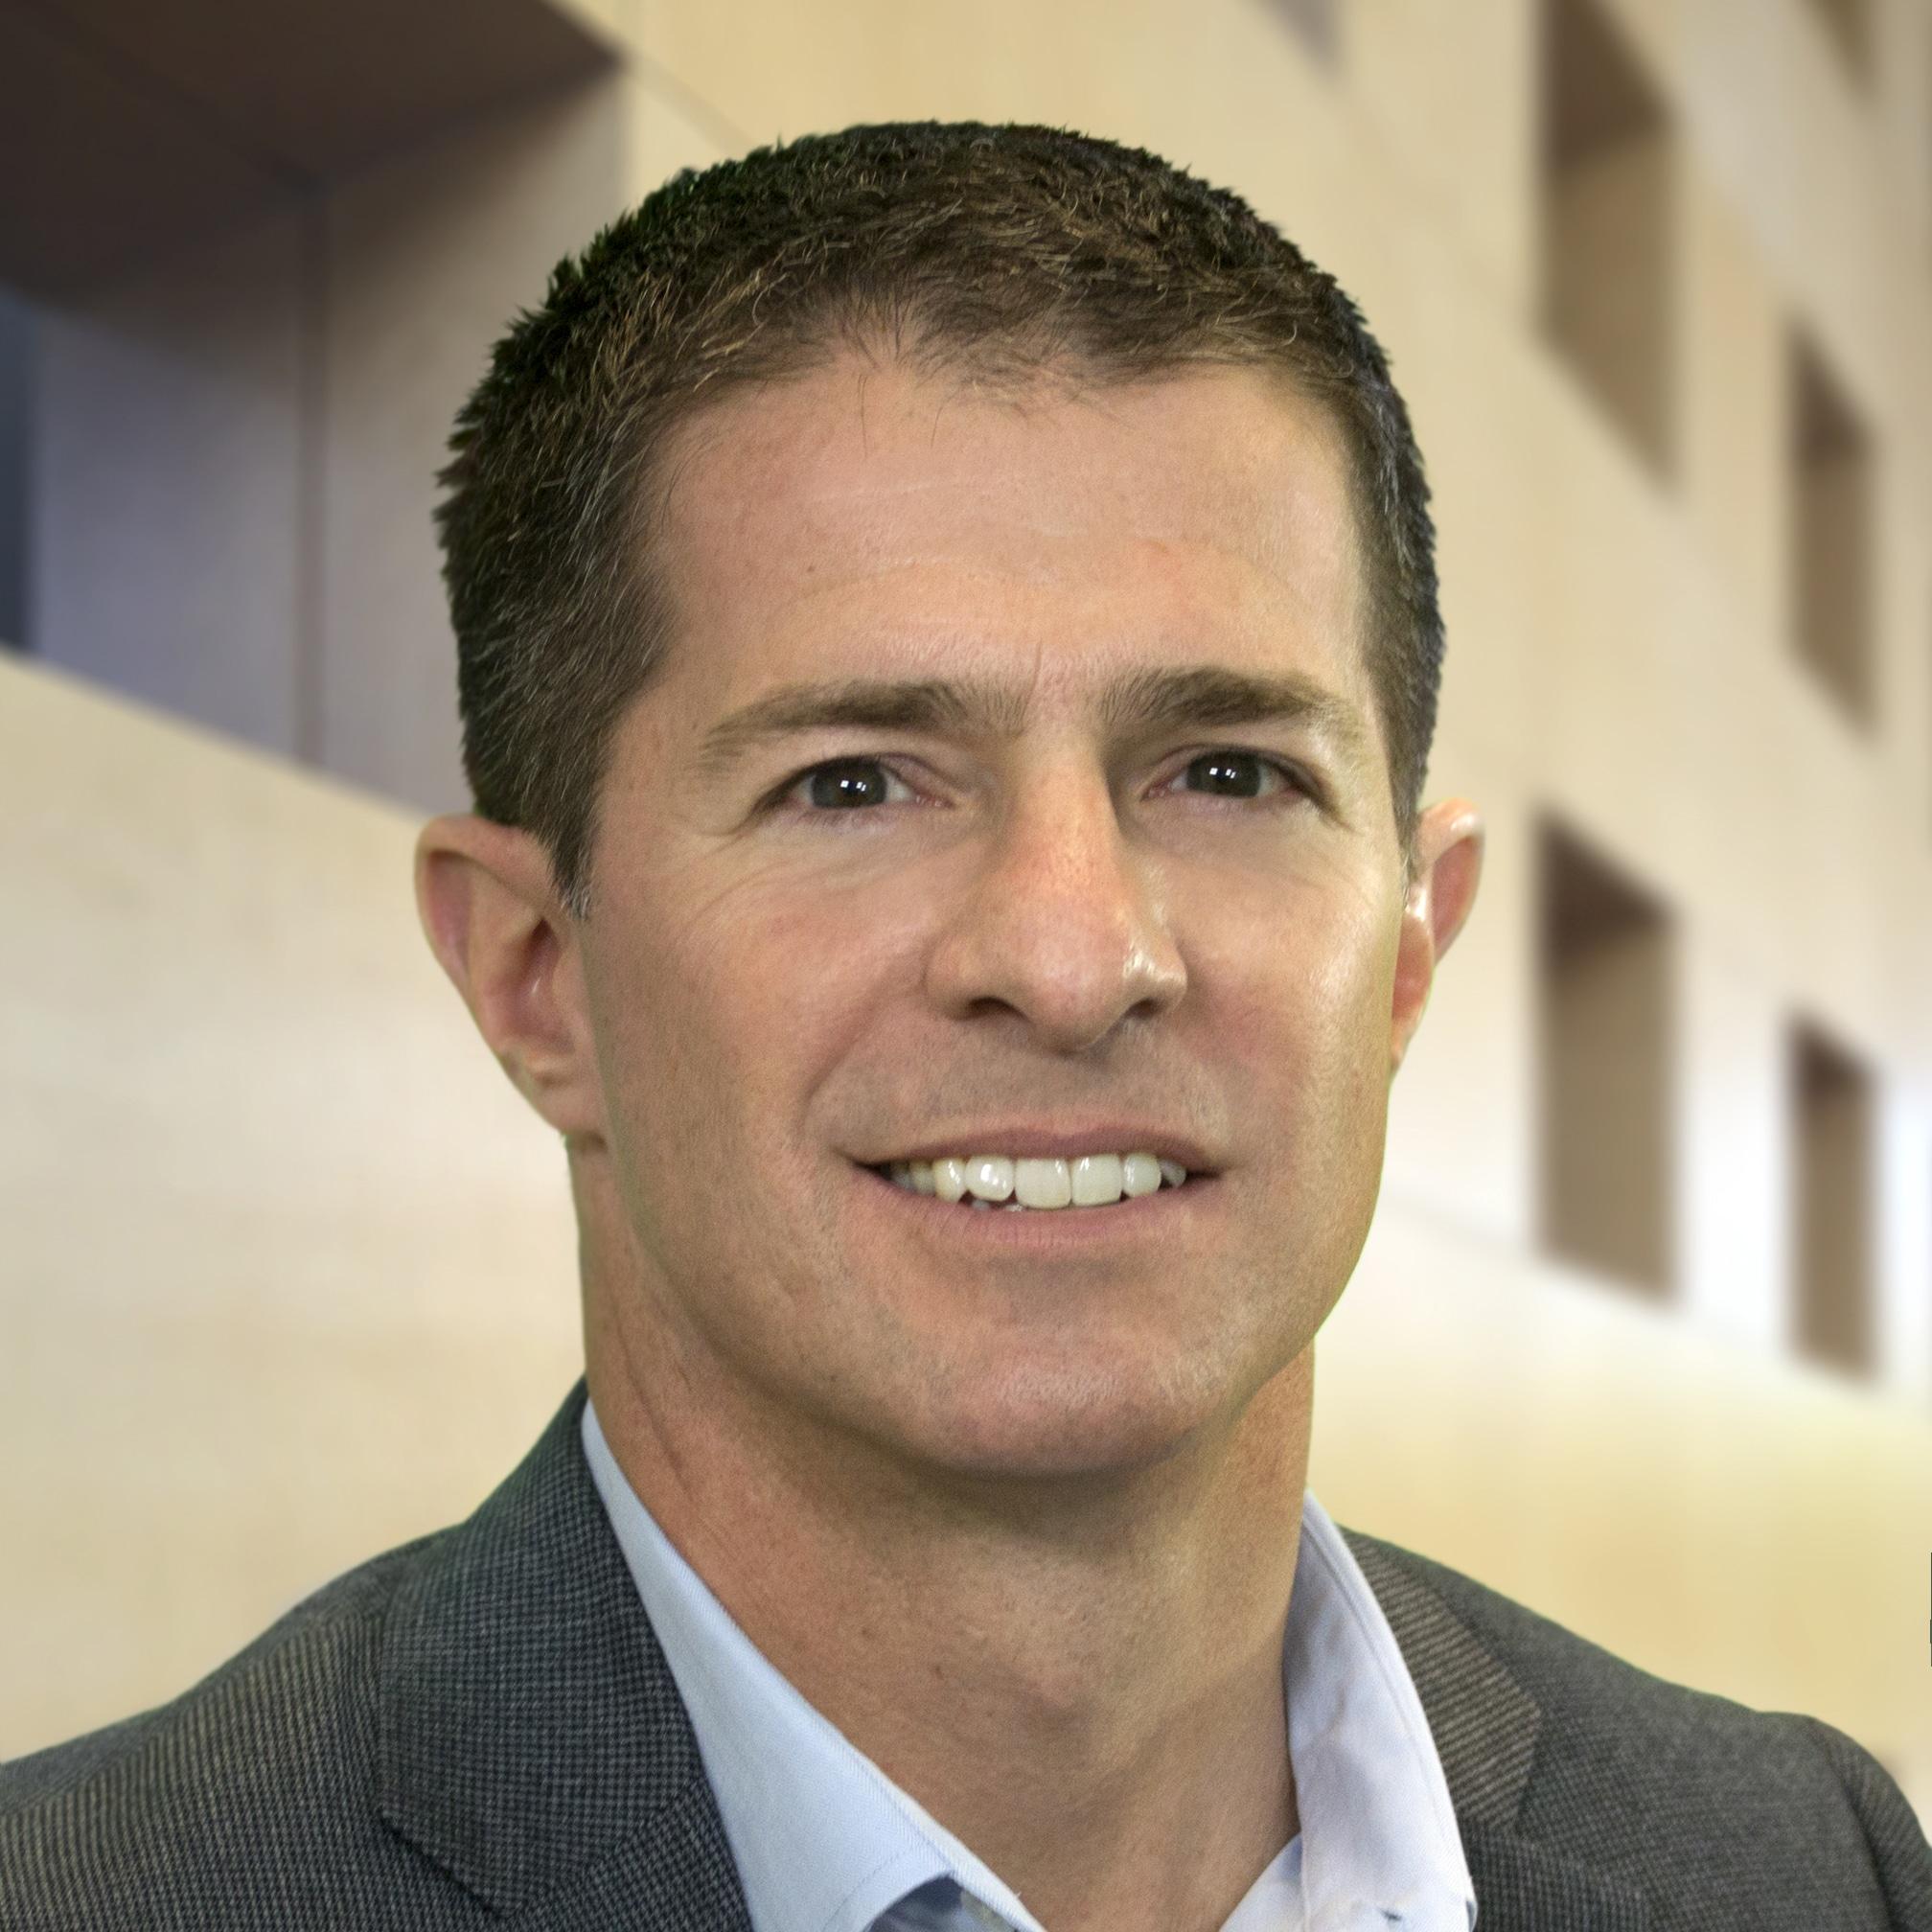 Marc Seewald